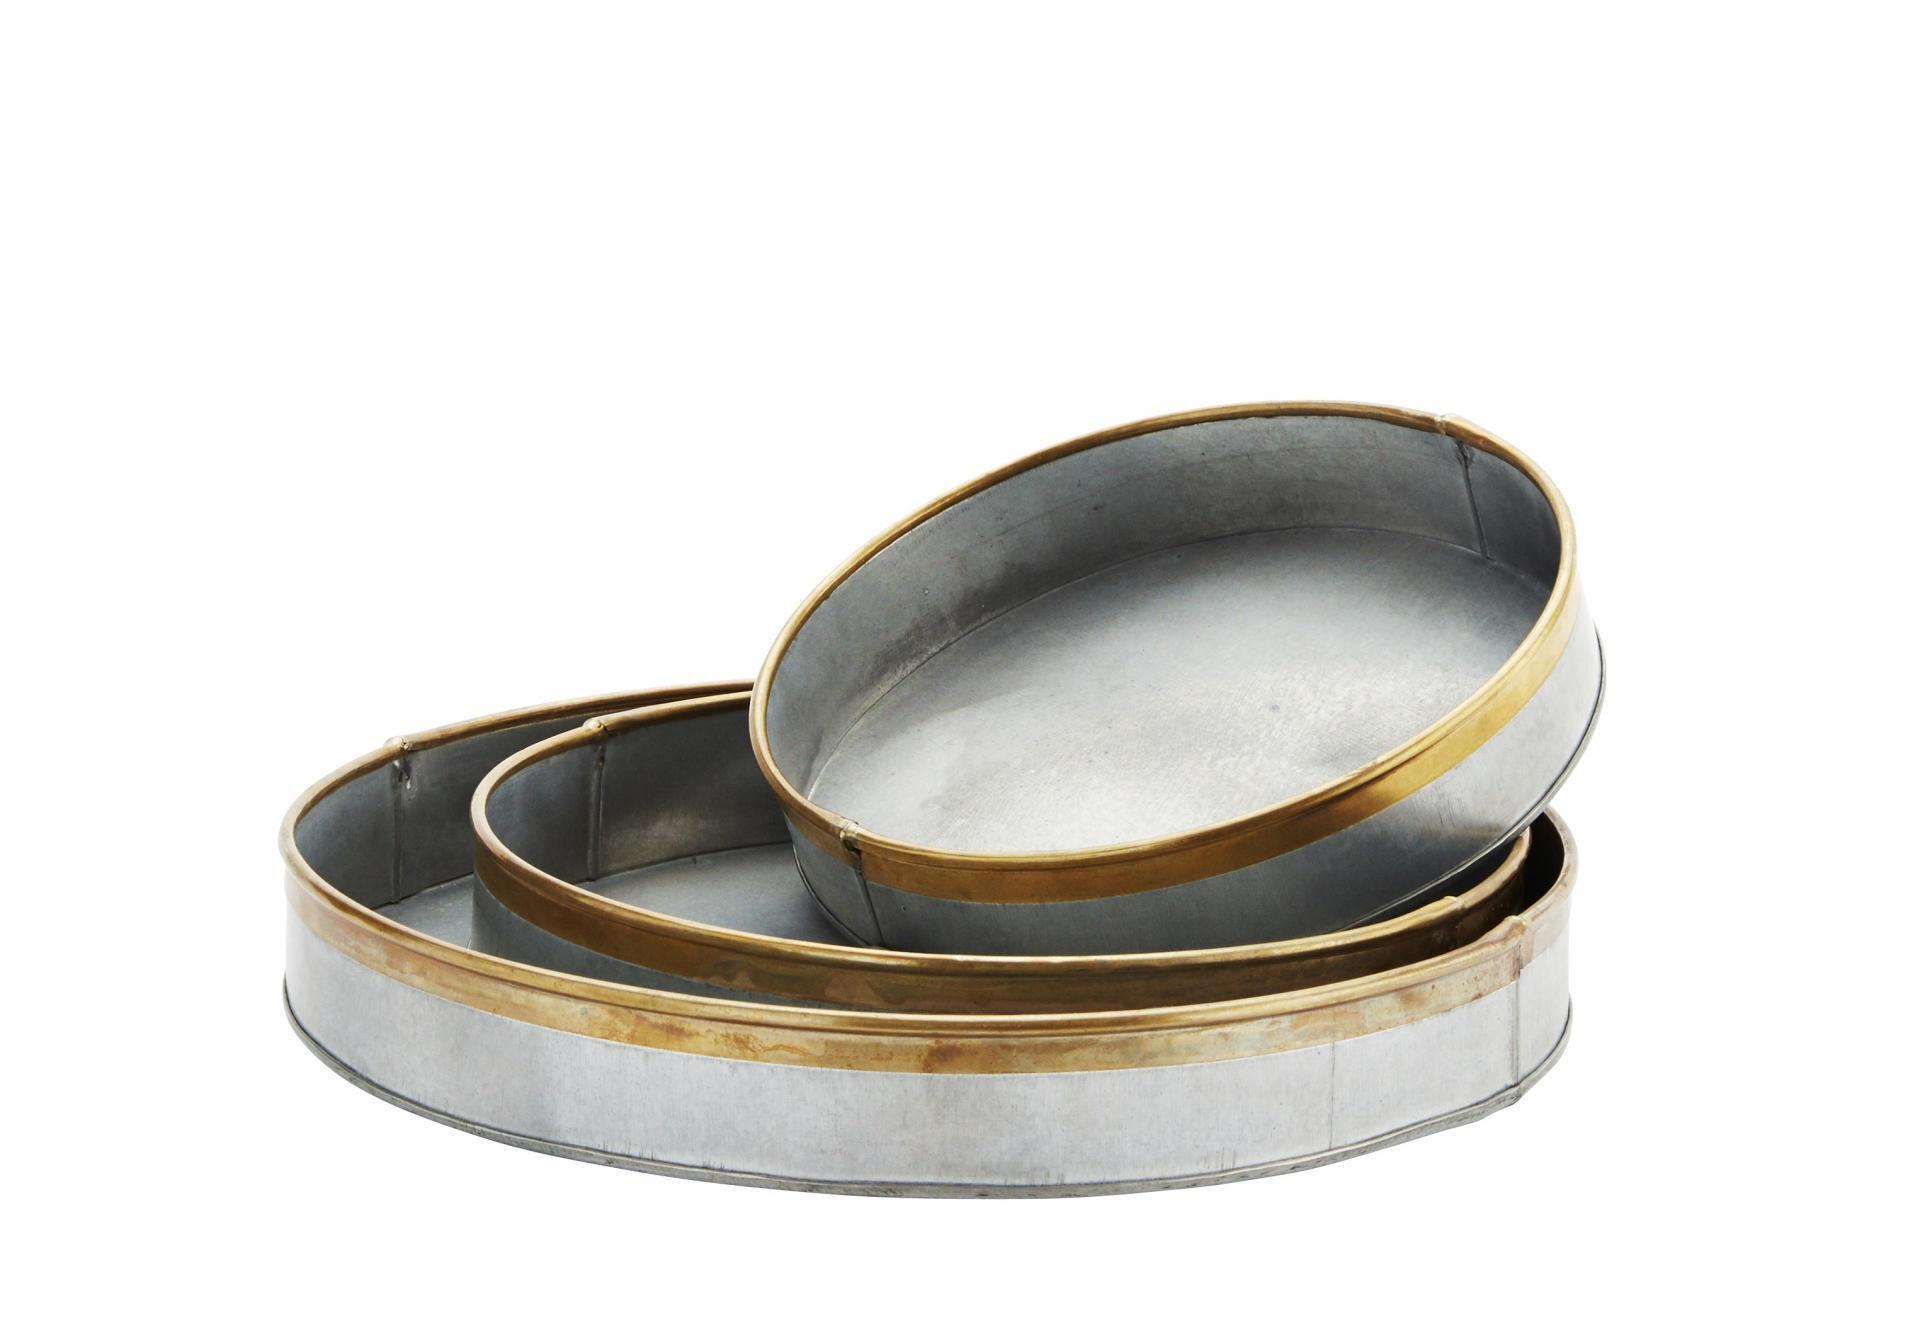 MADAM STOLTZ Kulatý zinkový tác Brass border Velikost L, šedá barva, zlatá barva, zinek